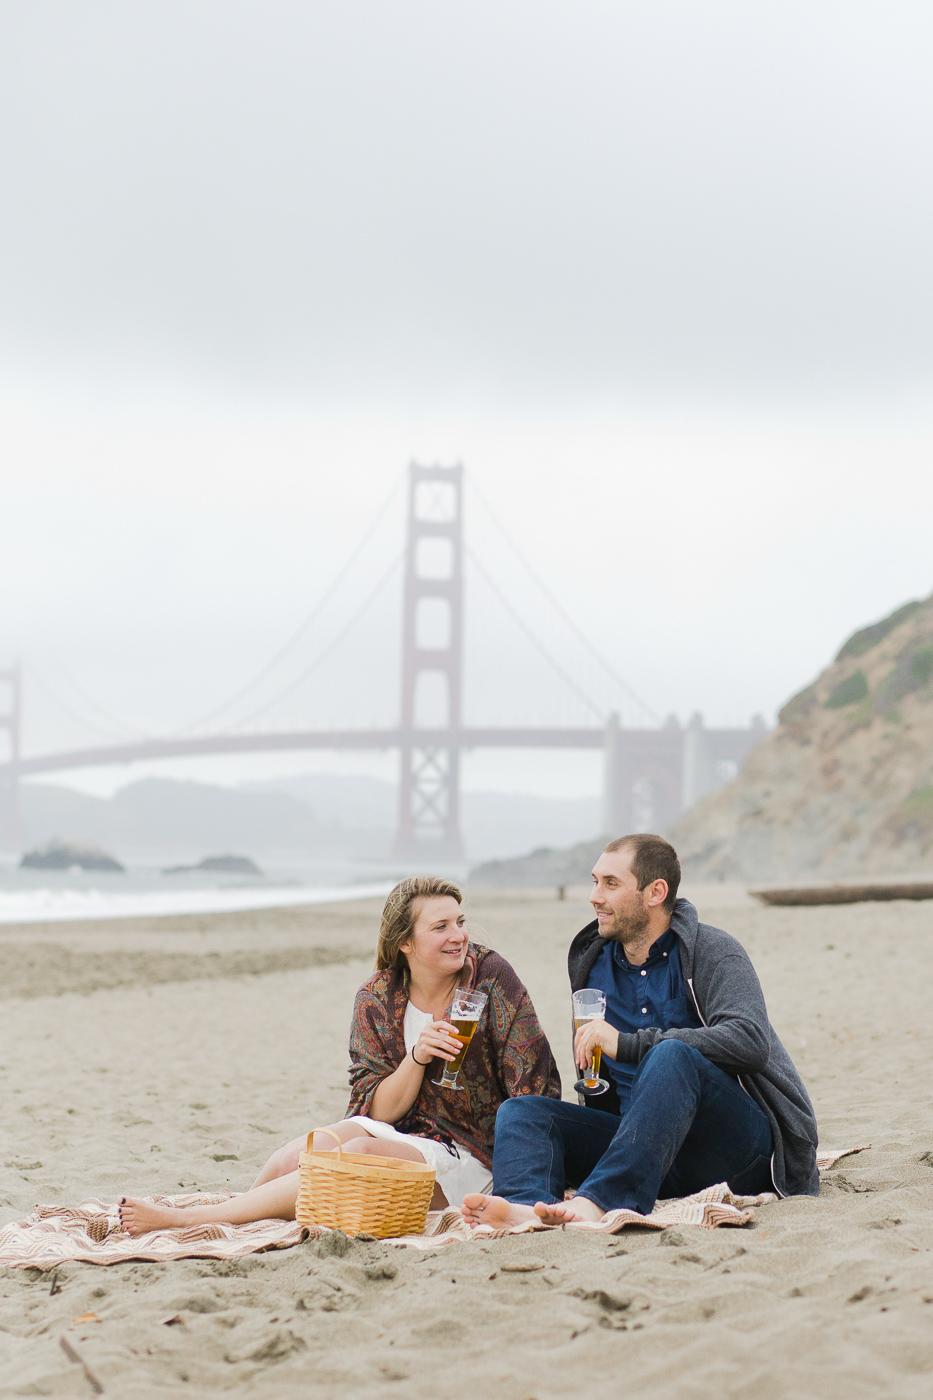 Baker-beach-san-francisco-california-engagement-session-9.jpg